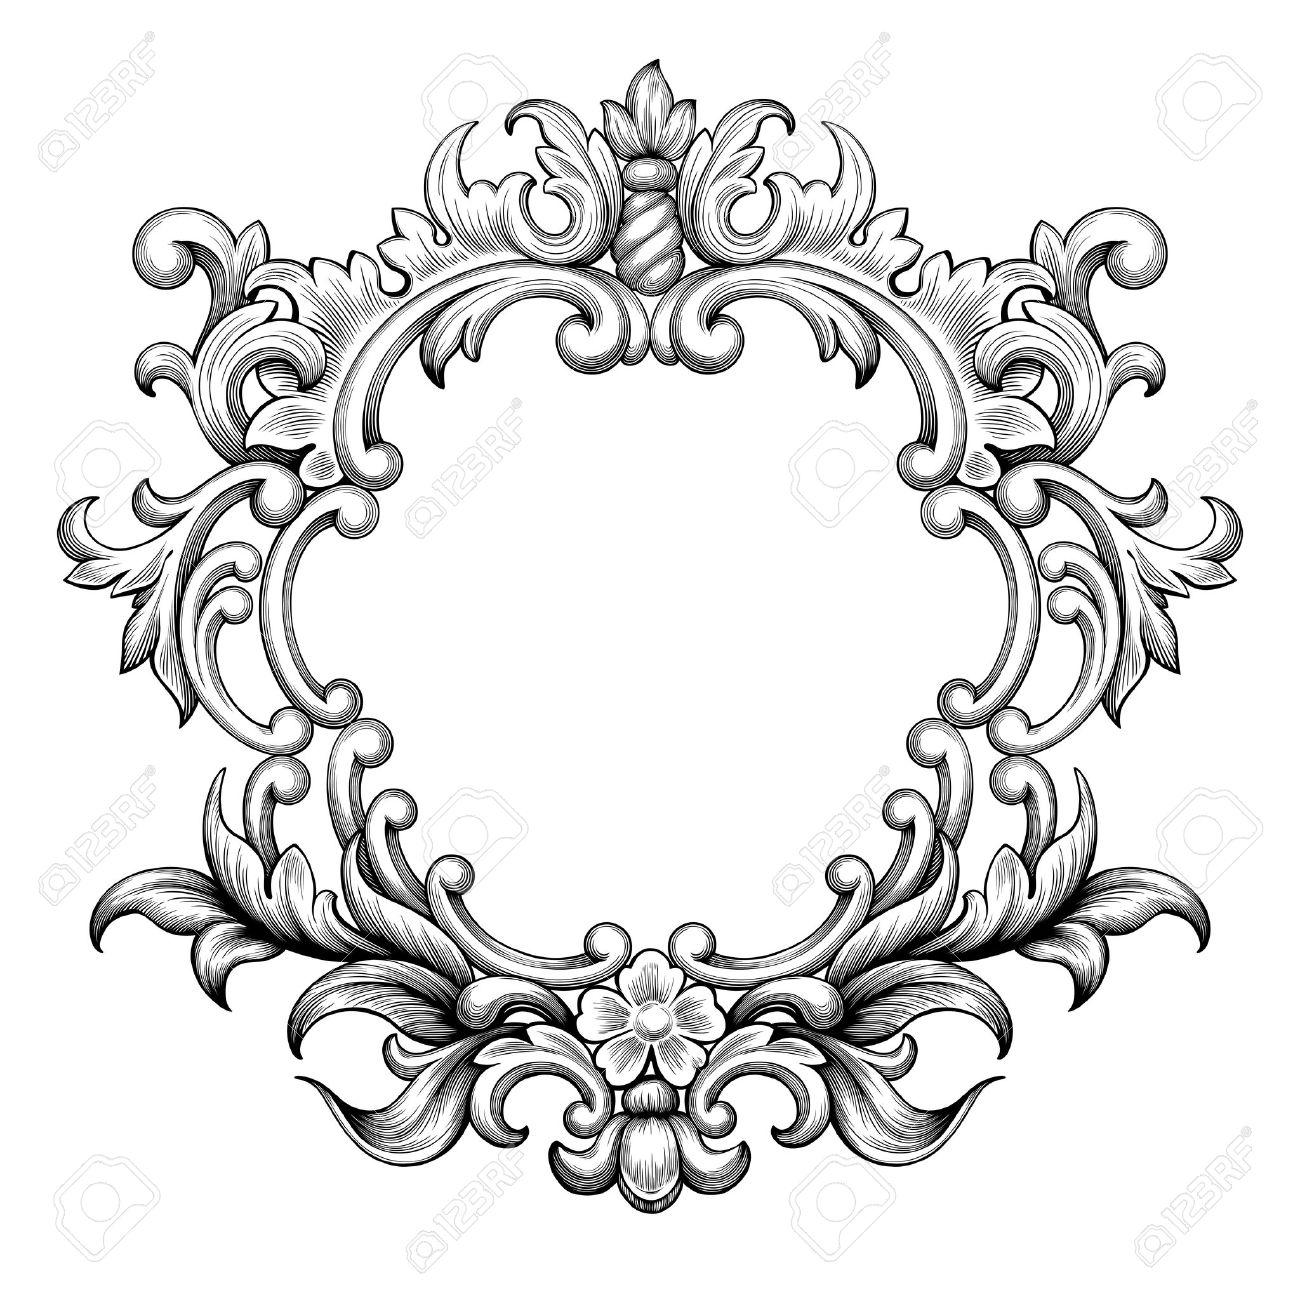 Vintage baroque frame border leaf scroll floral ornament engraving retro flower pattern antique style swirl decorative design element black and white filigree vector wedding invitation greeting card - 46103804